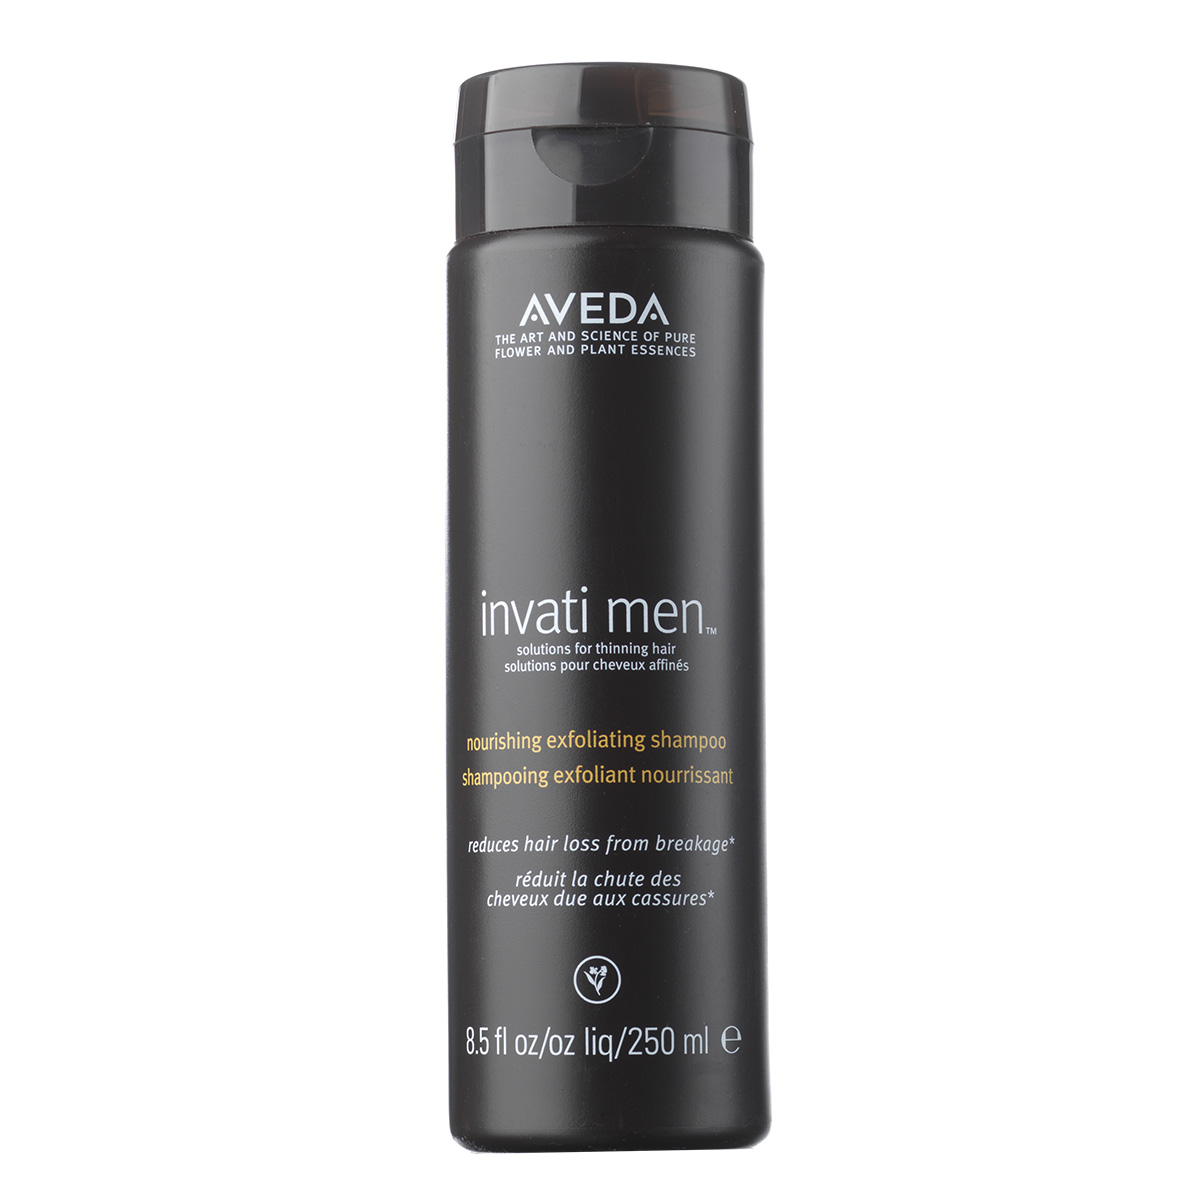 Billede af Aveda Invati Men Exfoliating Shampoo - 250 ml